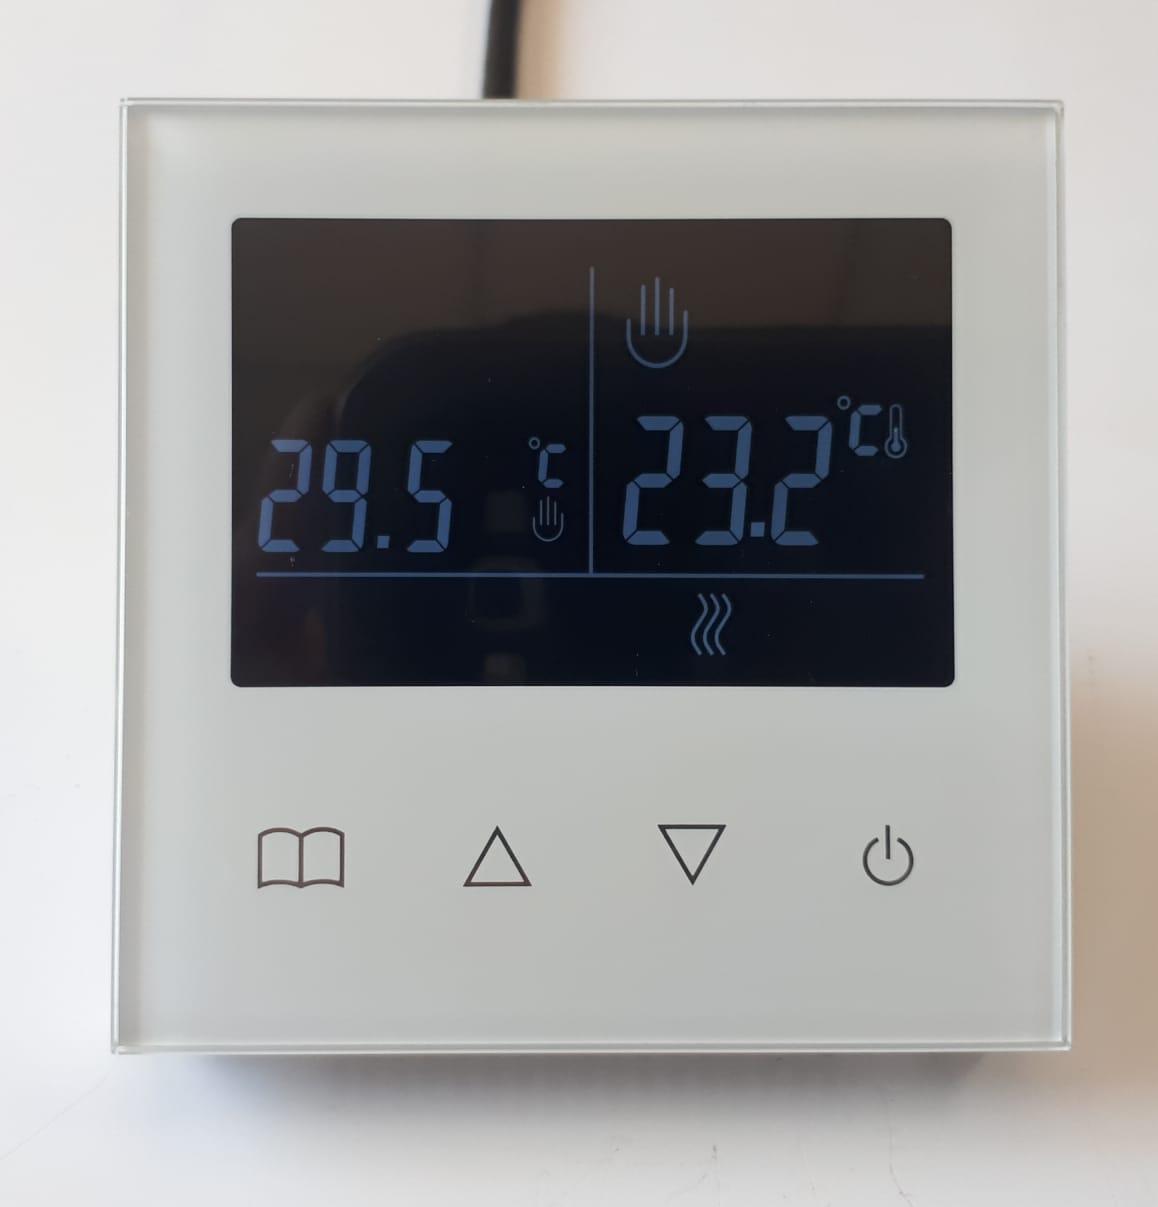 Терморегулятор E93